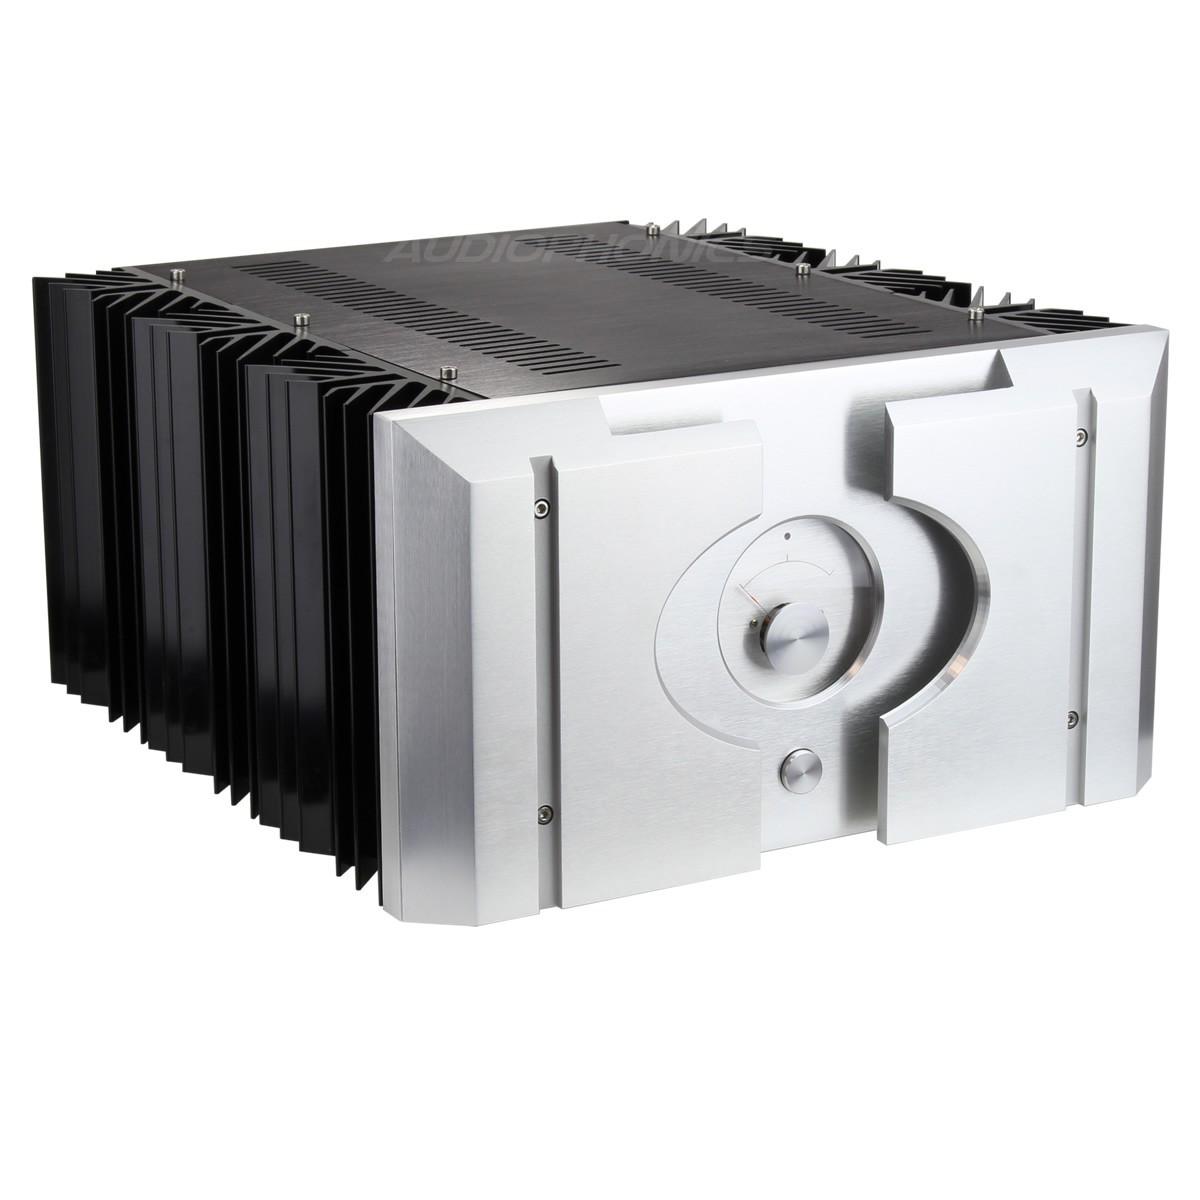 DIY Aluminium Case with Power Indicator and Heatsink 396x360x195mm